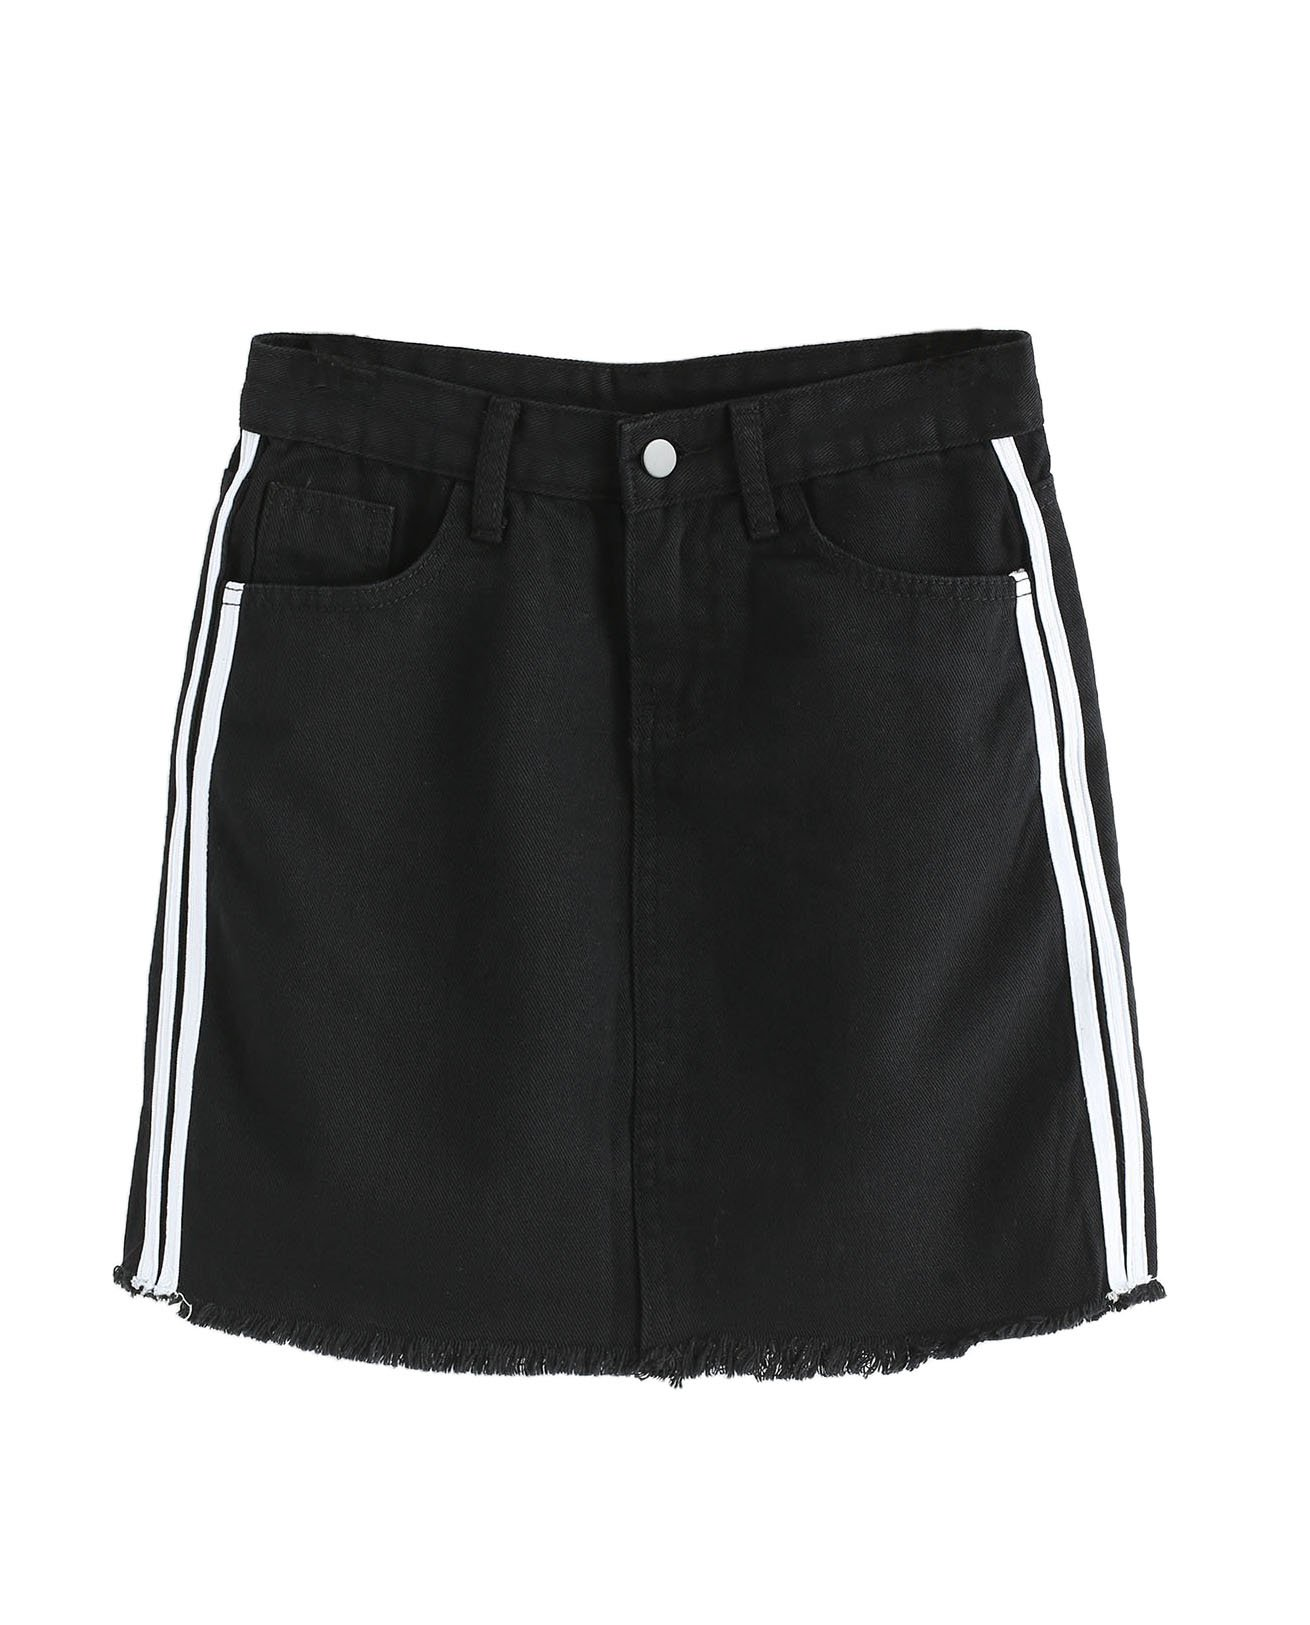 Verdusa Women's Casual Distressed Fray Hem A-Line Denim Short Skirt Black-Striped L